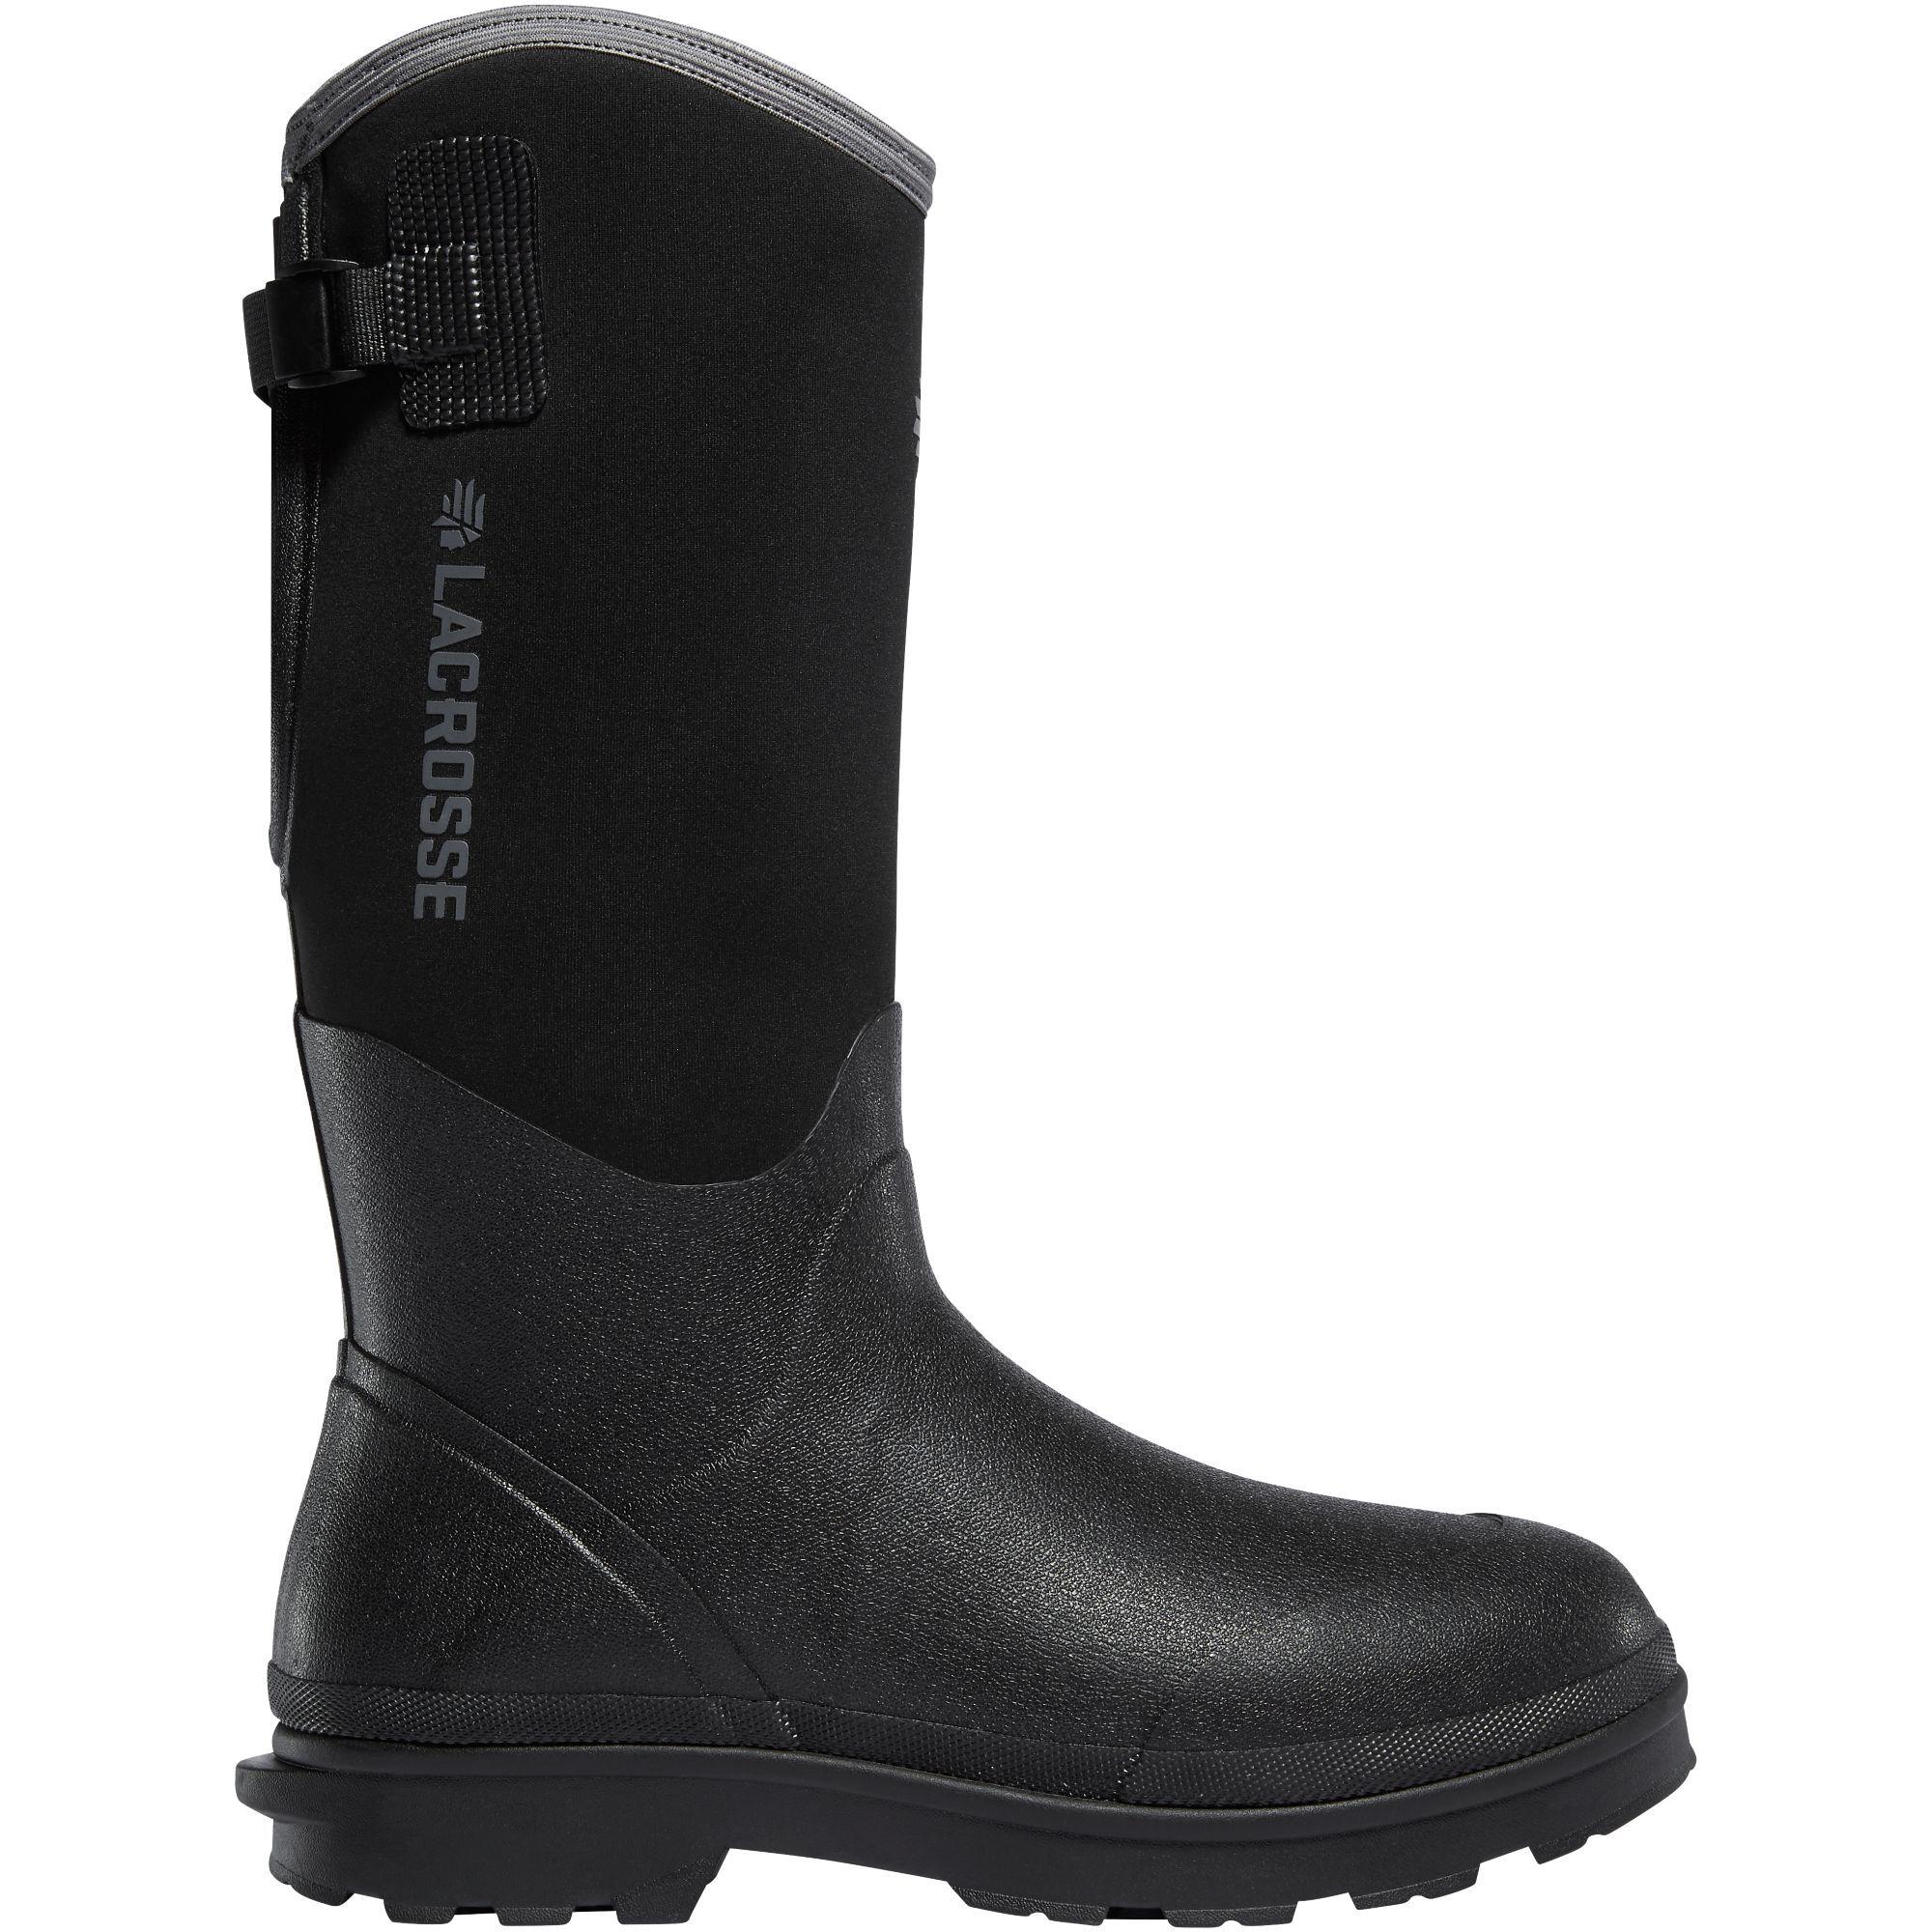 "LaCrosse Alpha Range 14"" 5mm Boots (9)- Black"